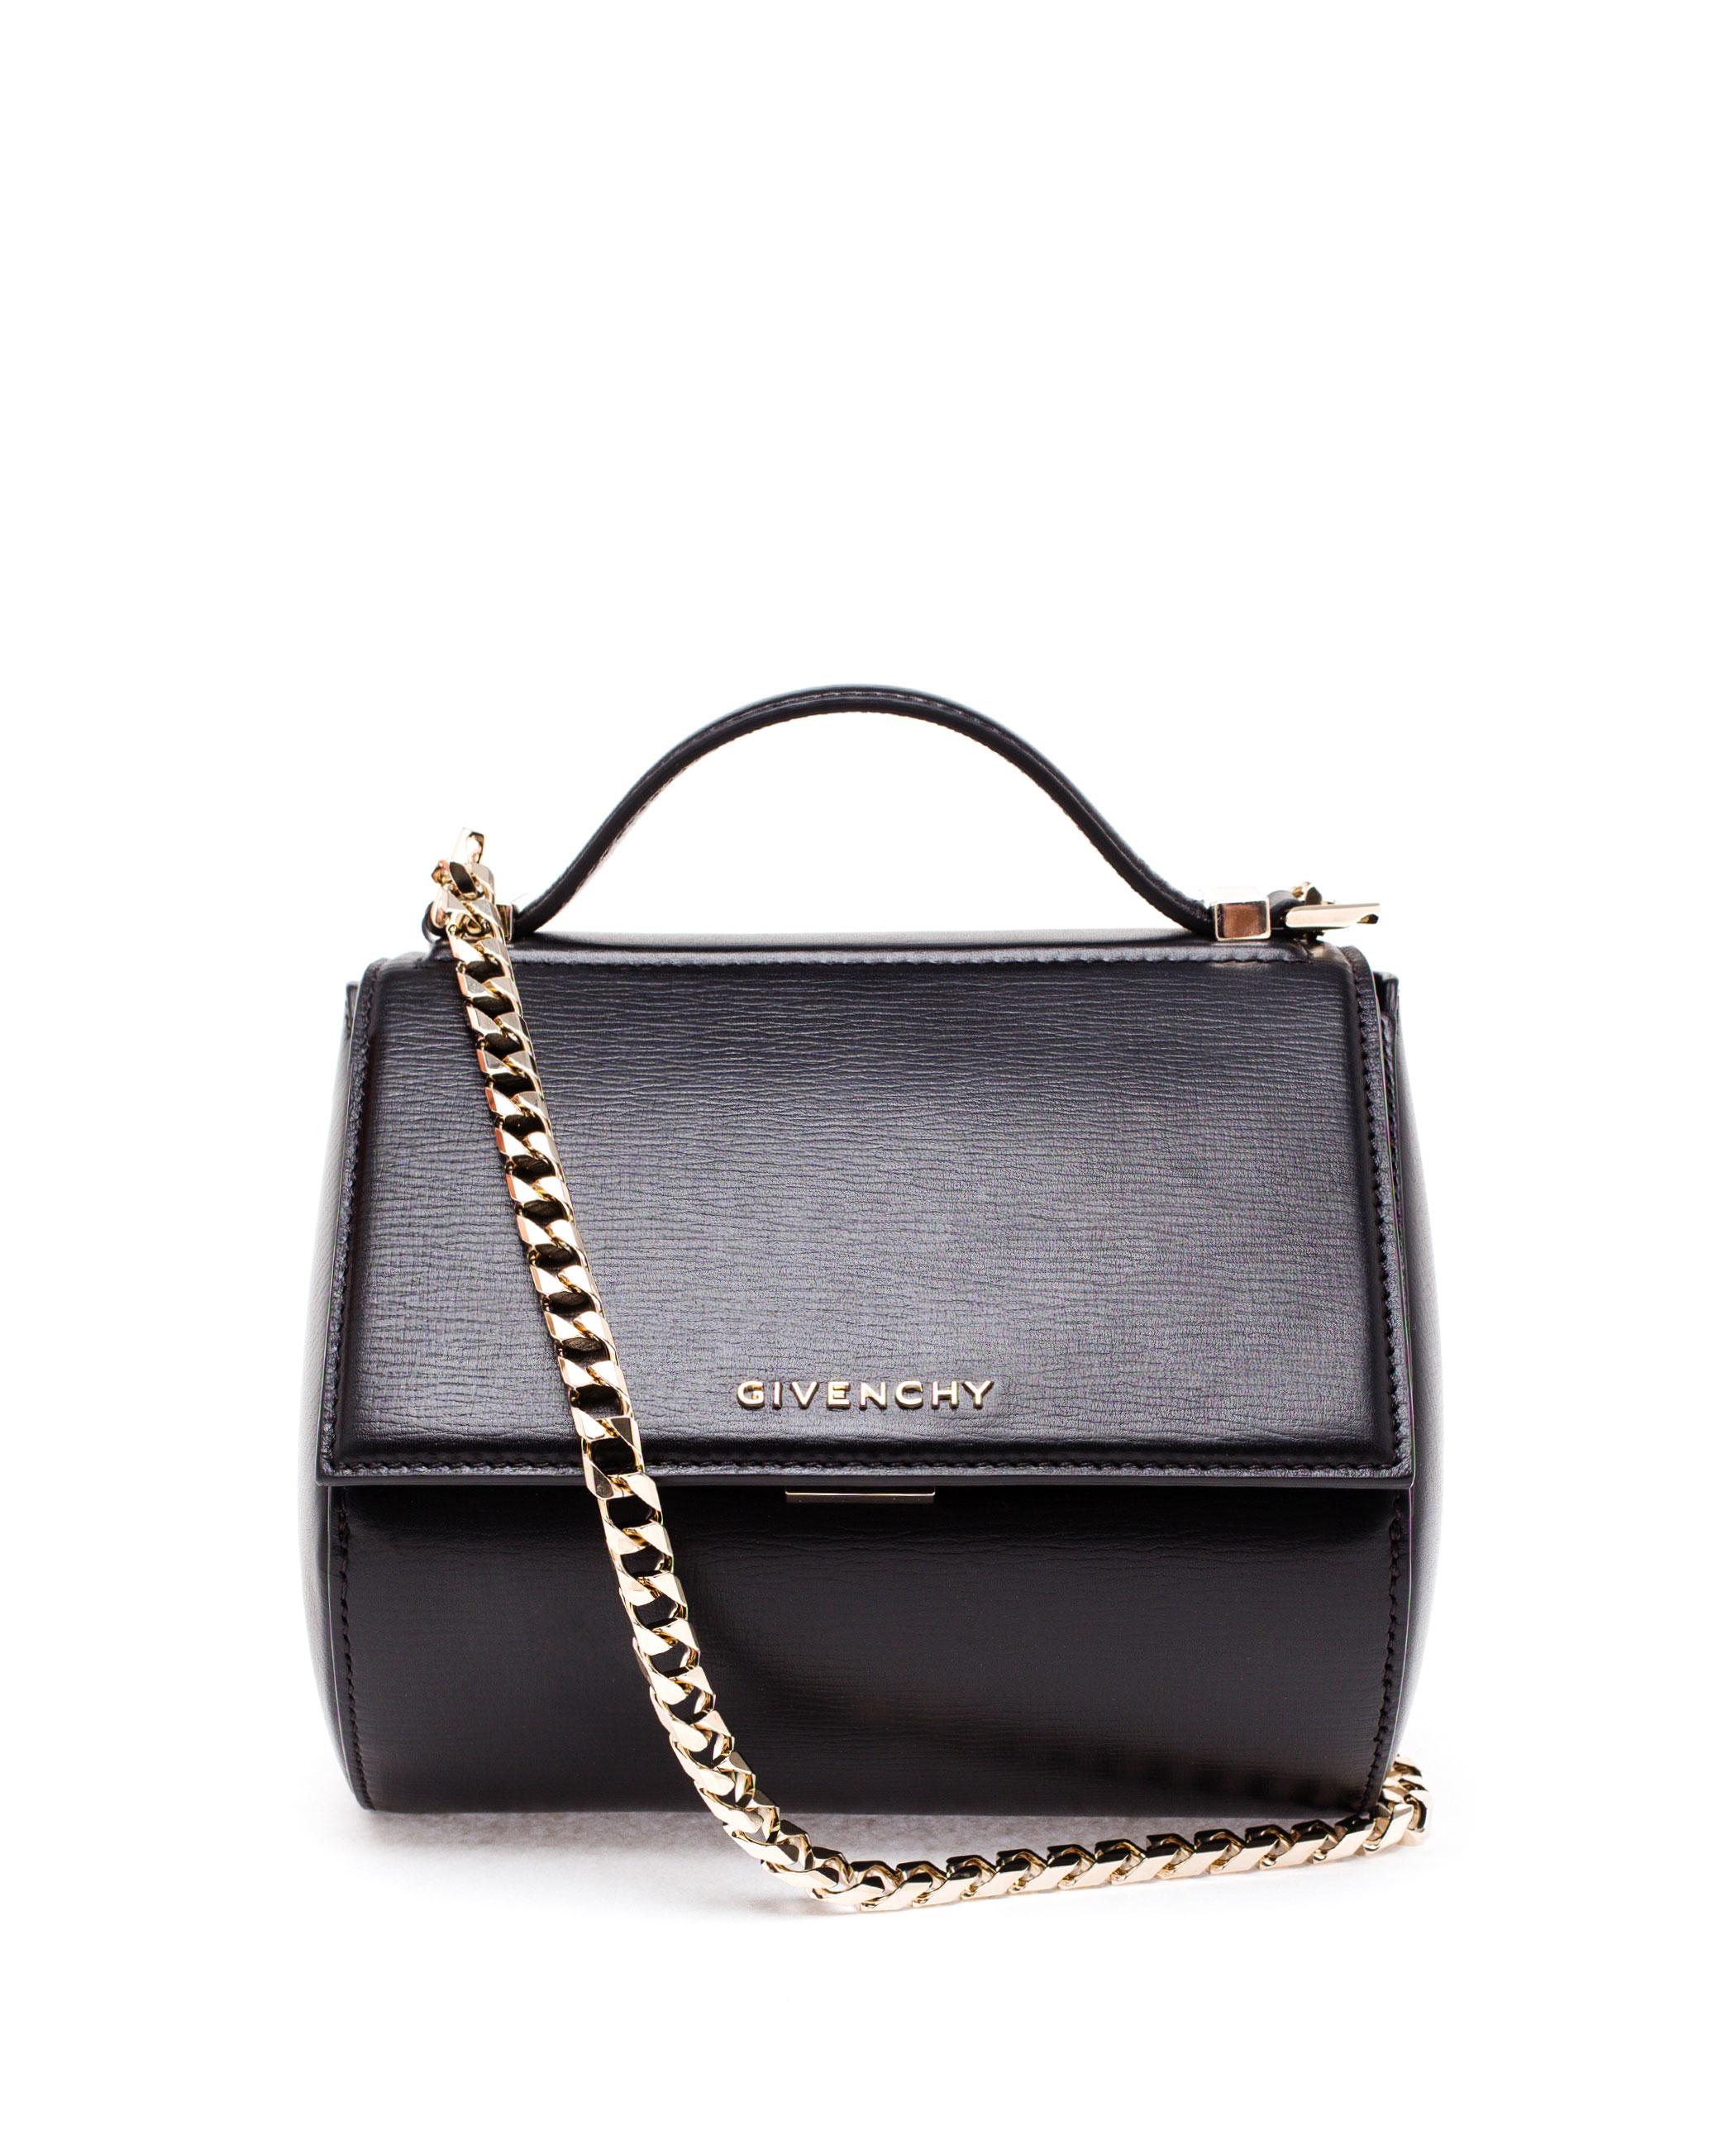 4751304d88 Givenchy Mini Leather Pandora Box Bag in Black - Lyst